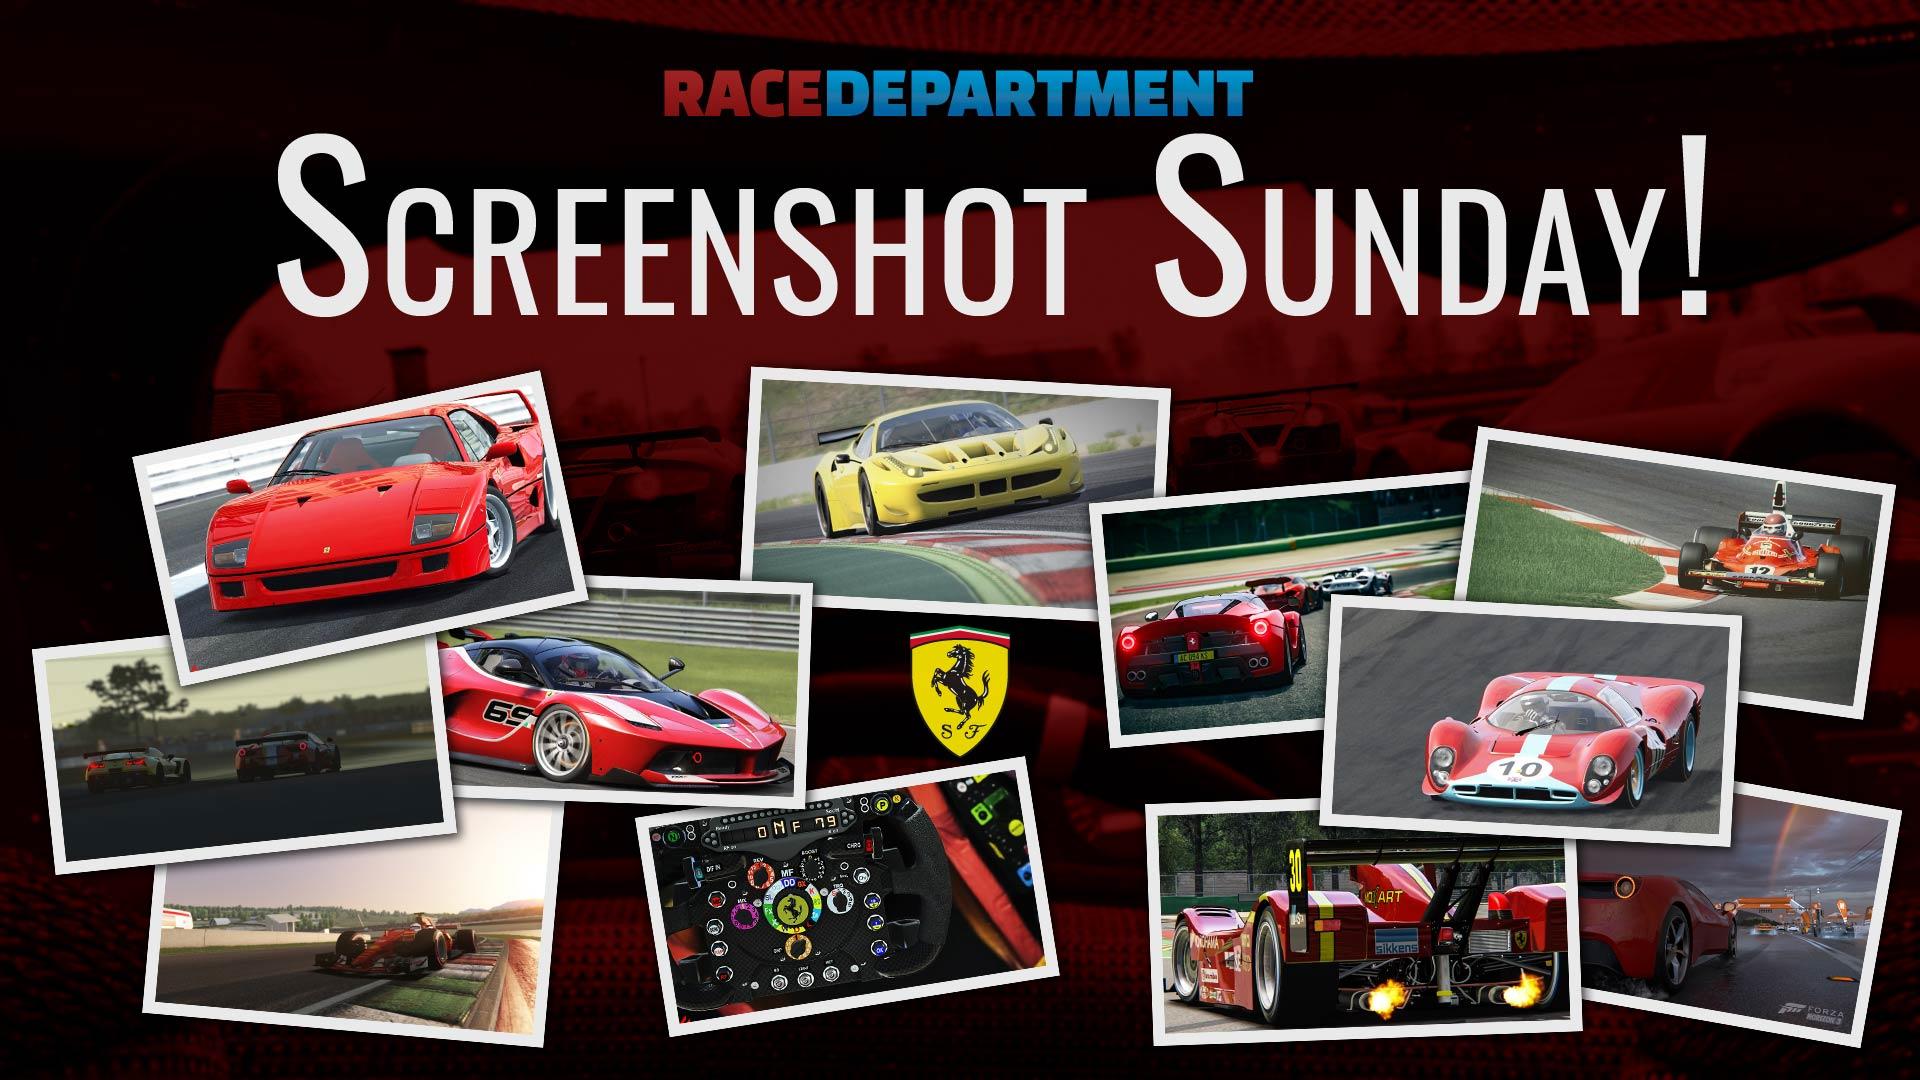 Screenshot Sunday - Ferrari.jpg